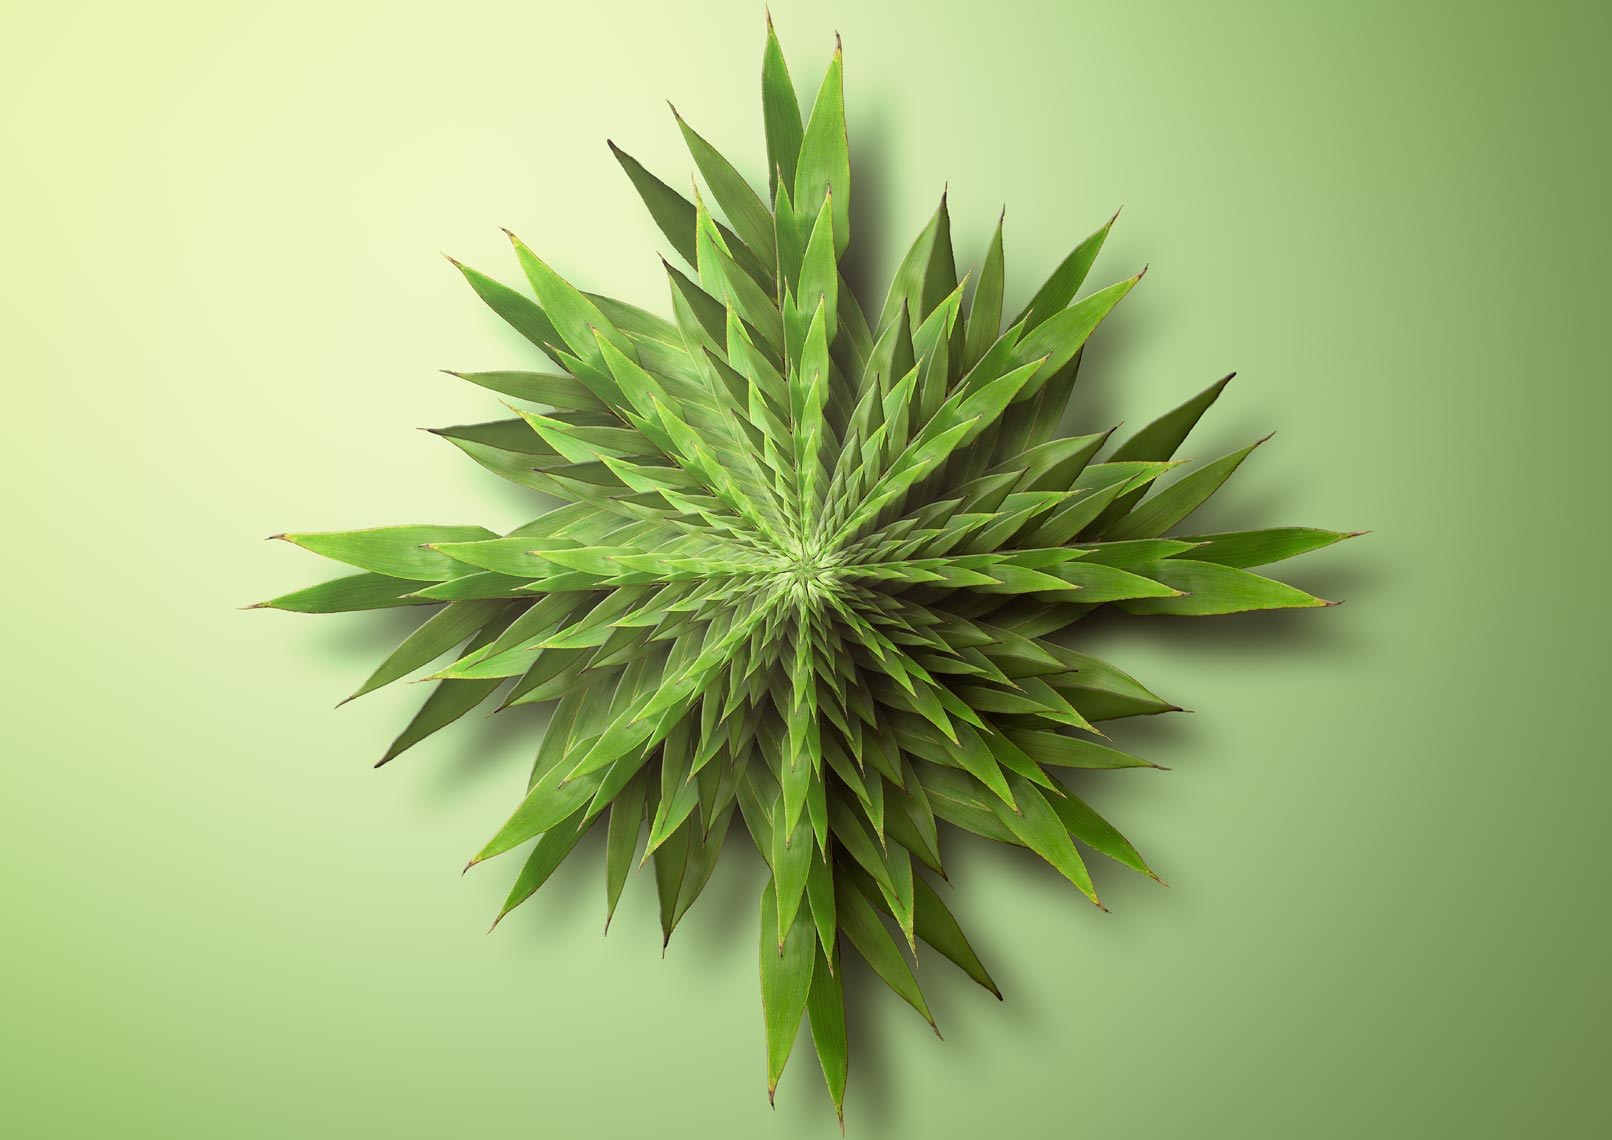 Bamboo Fractal